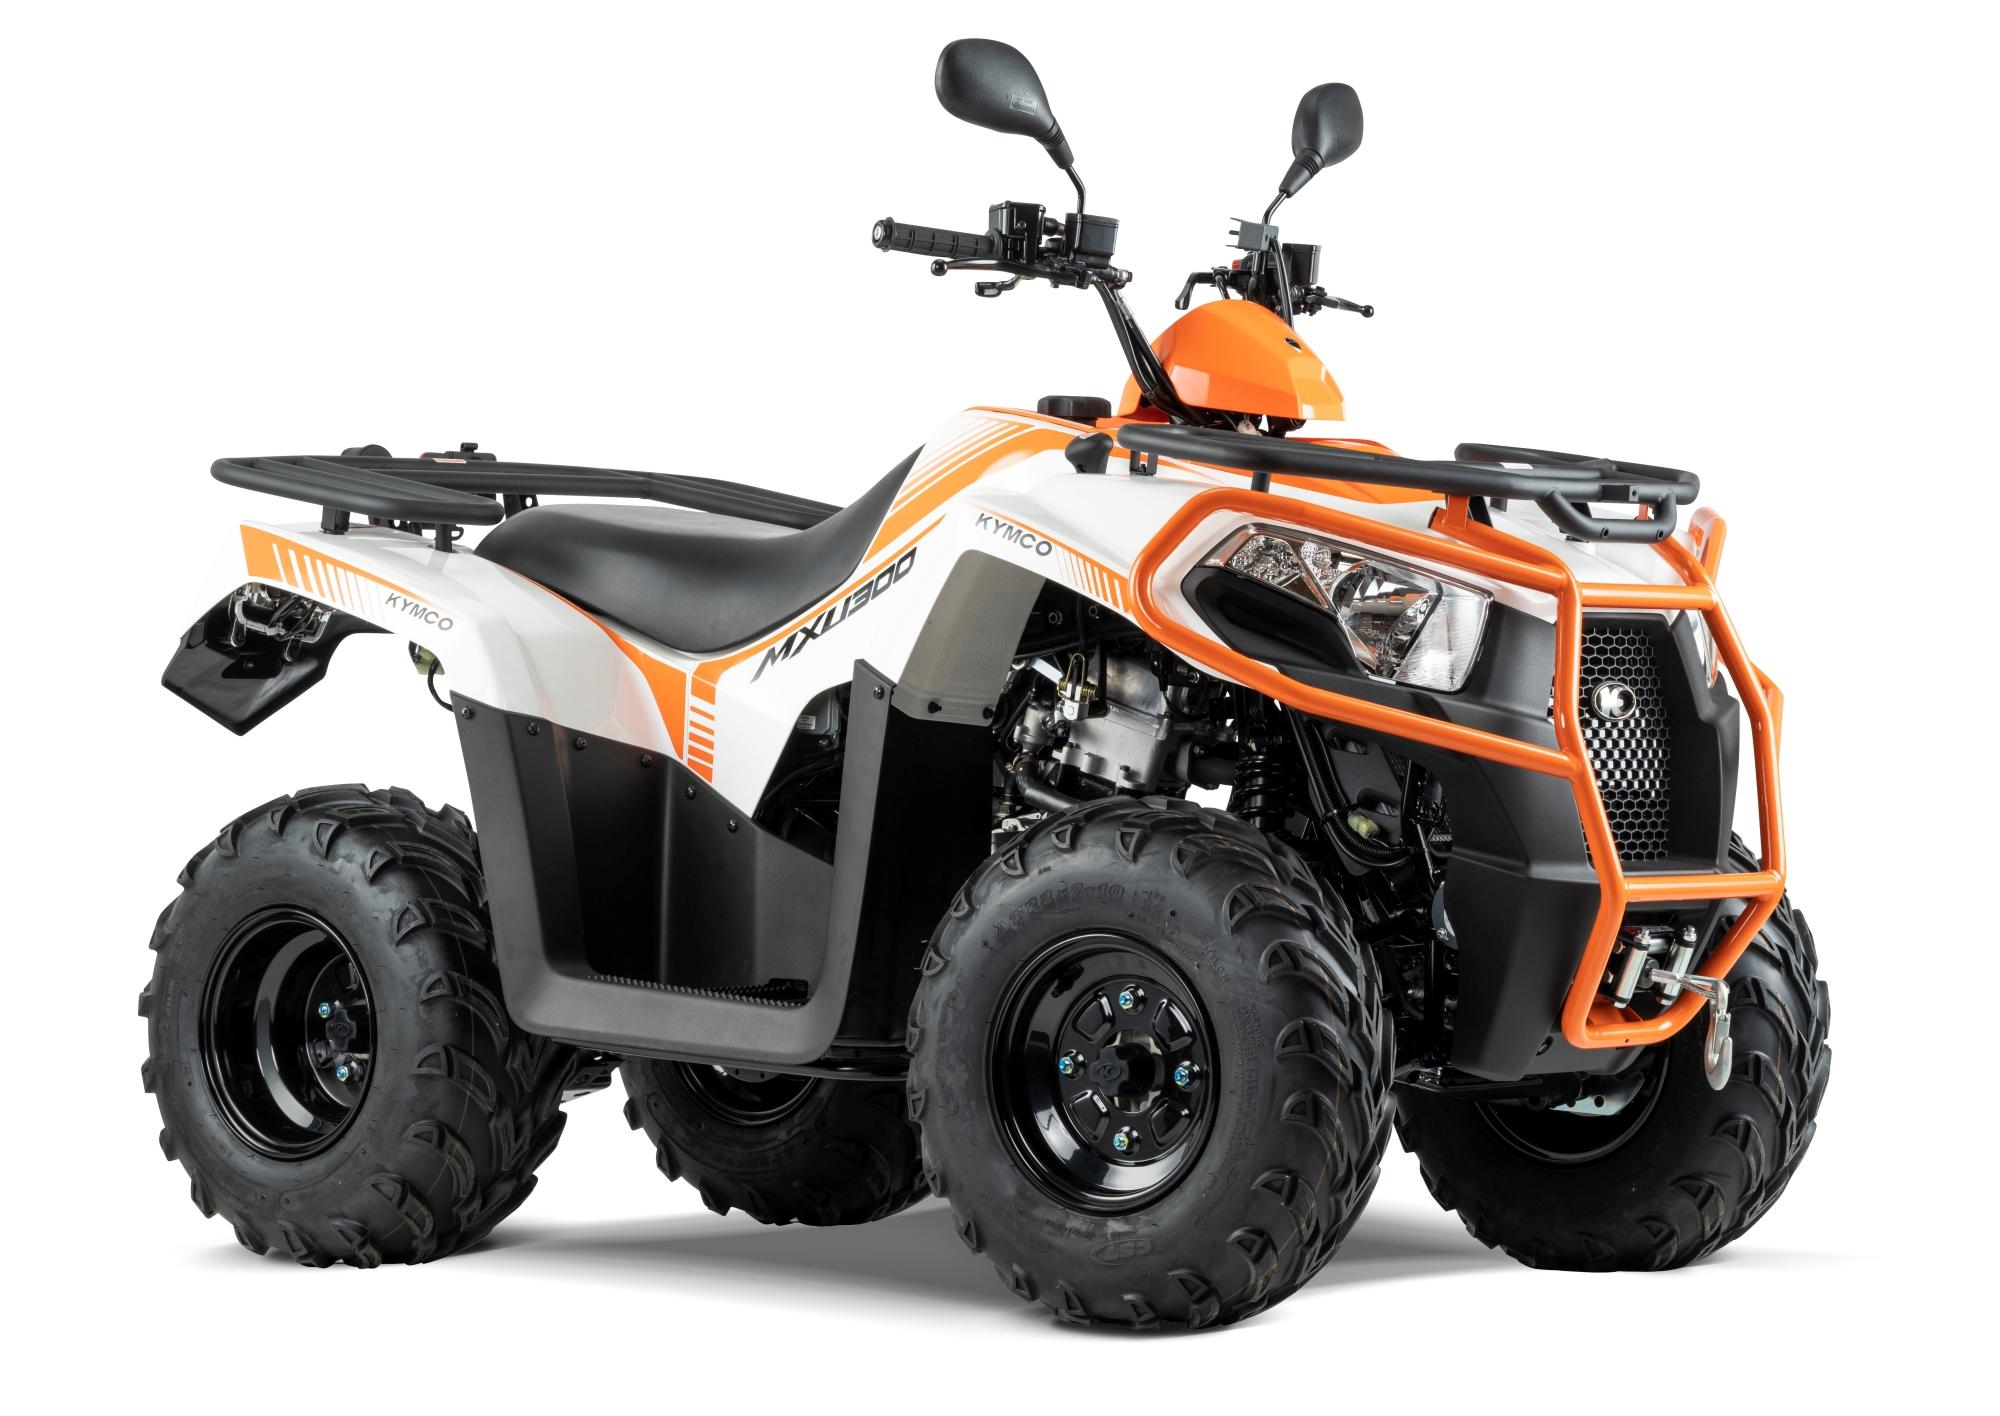 Netze Nerfbar Yamaha Raptor YFM 660 R orange 3 /& 2